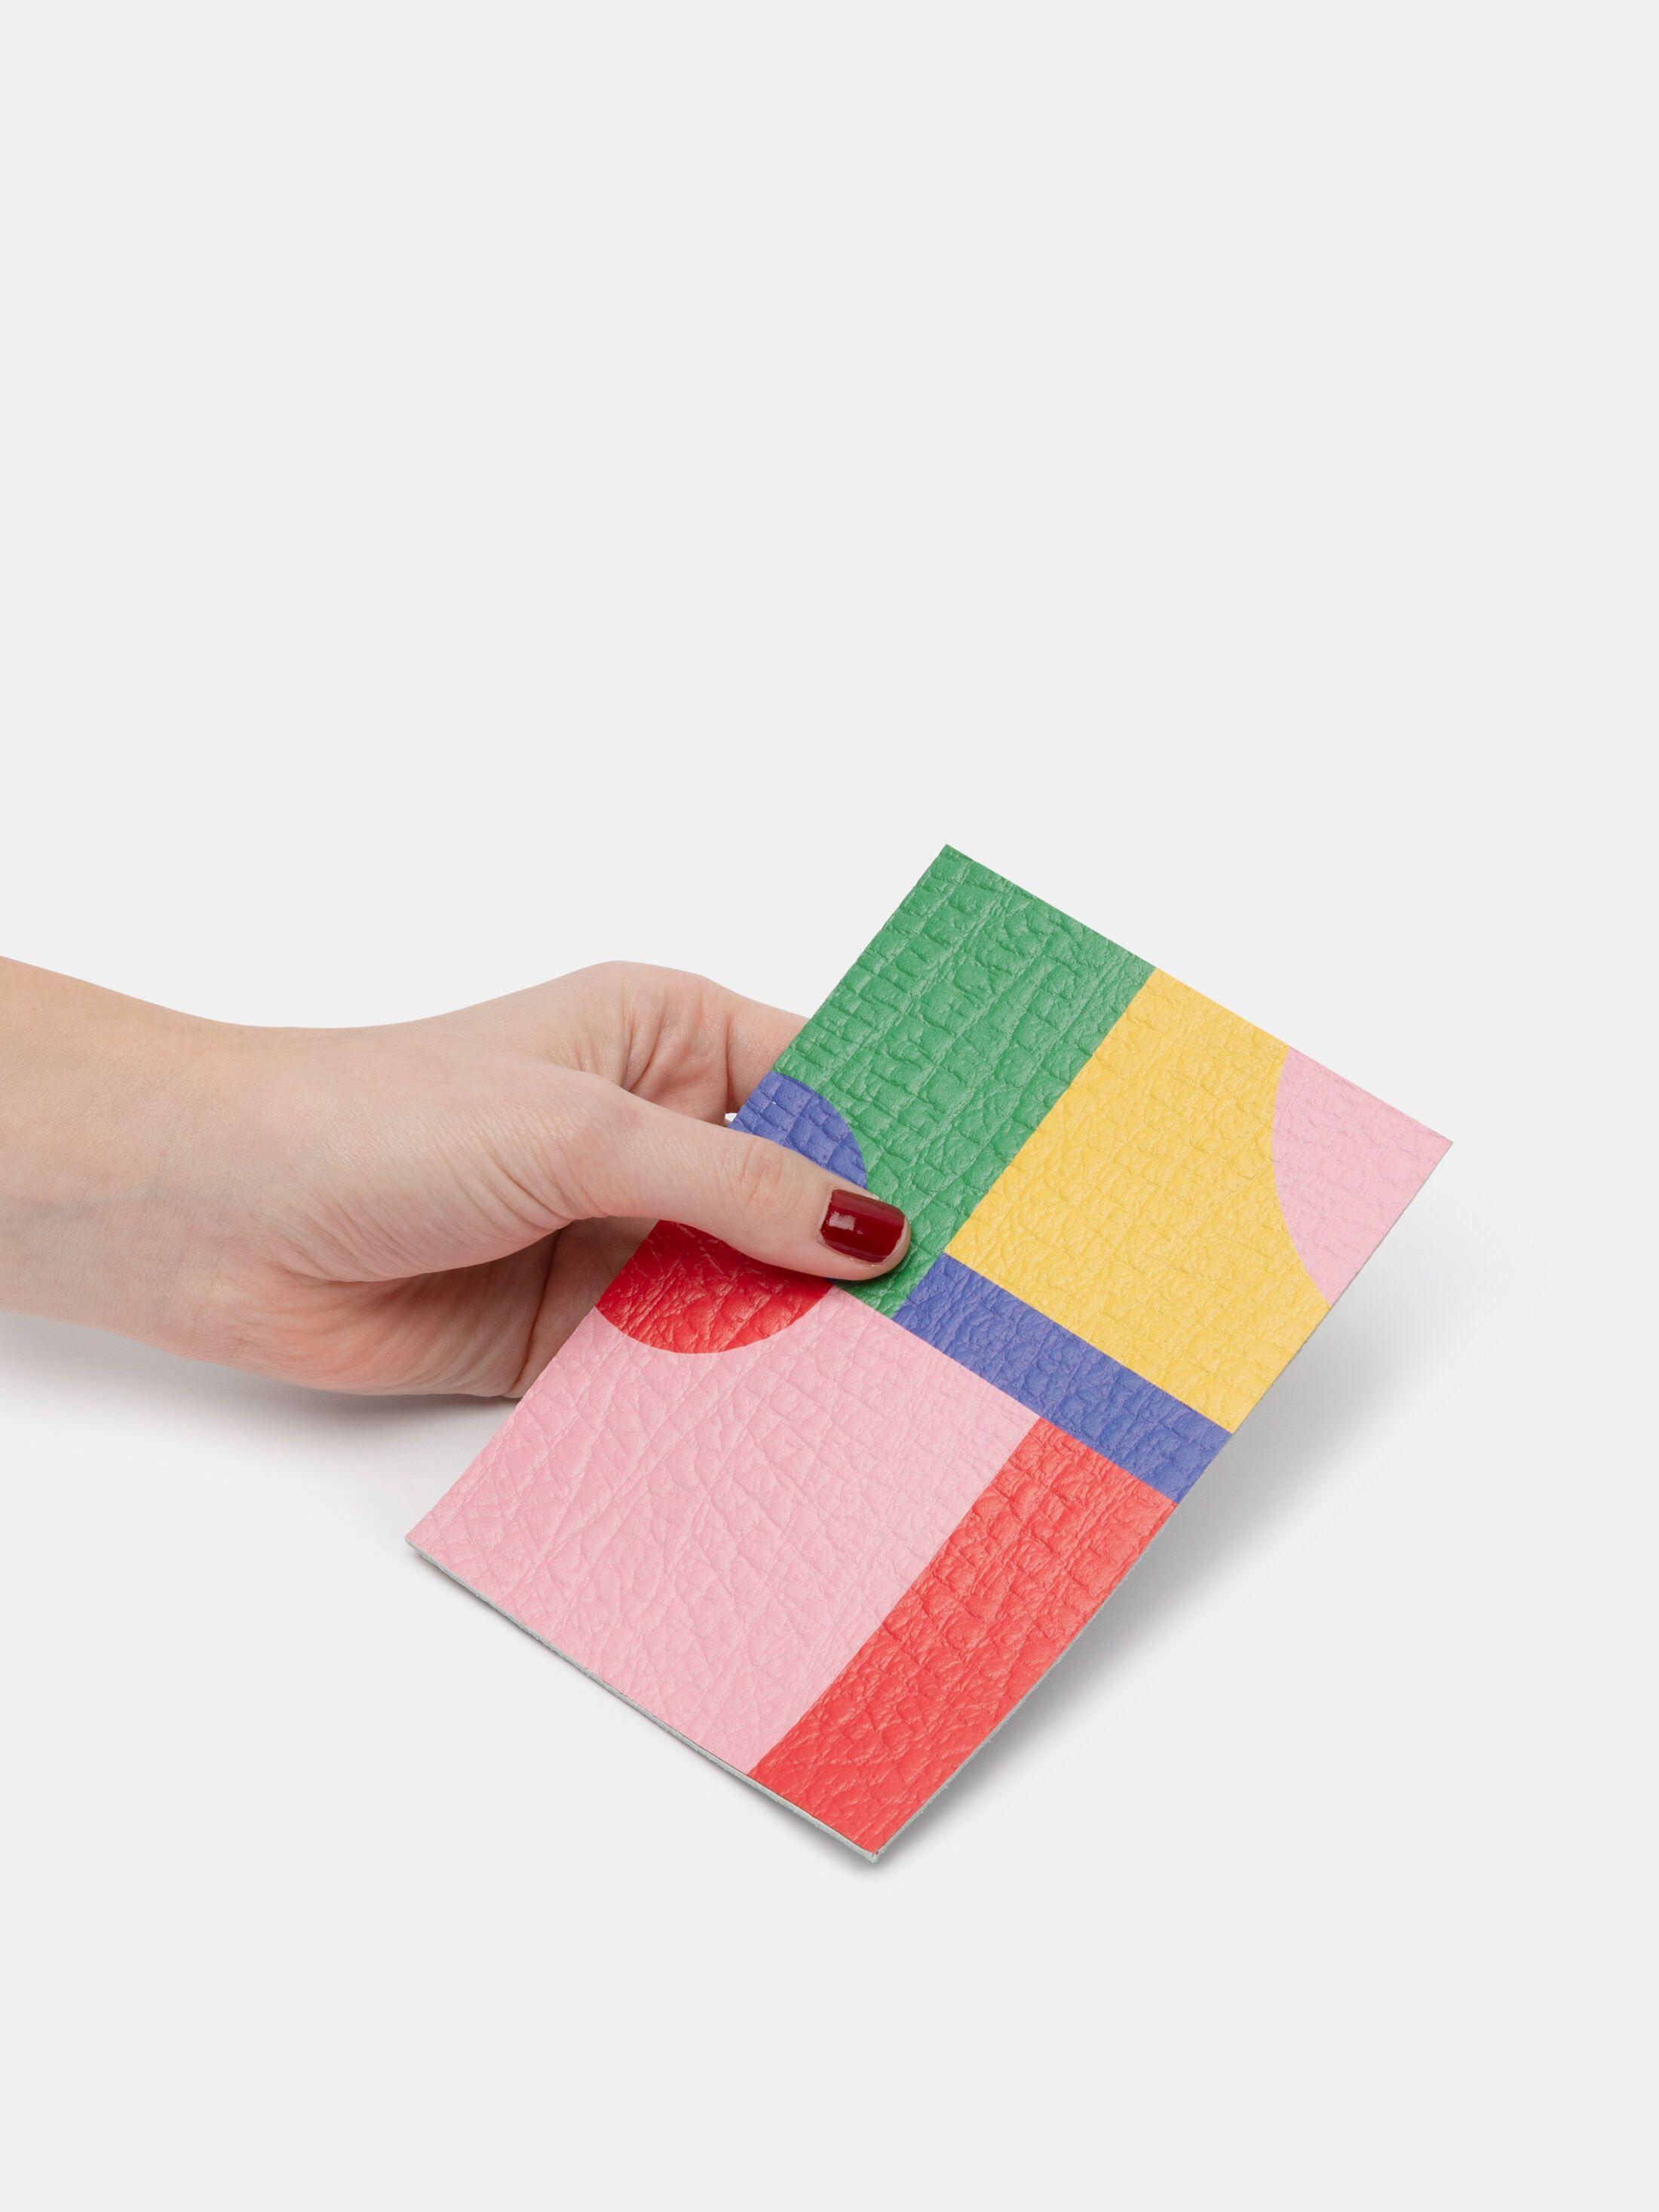 textured nappa custom leather fabric samples